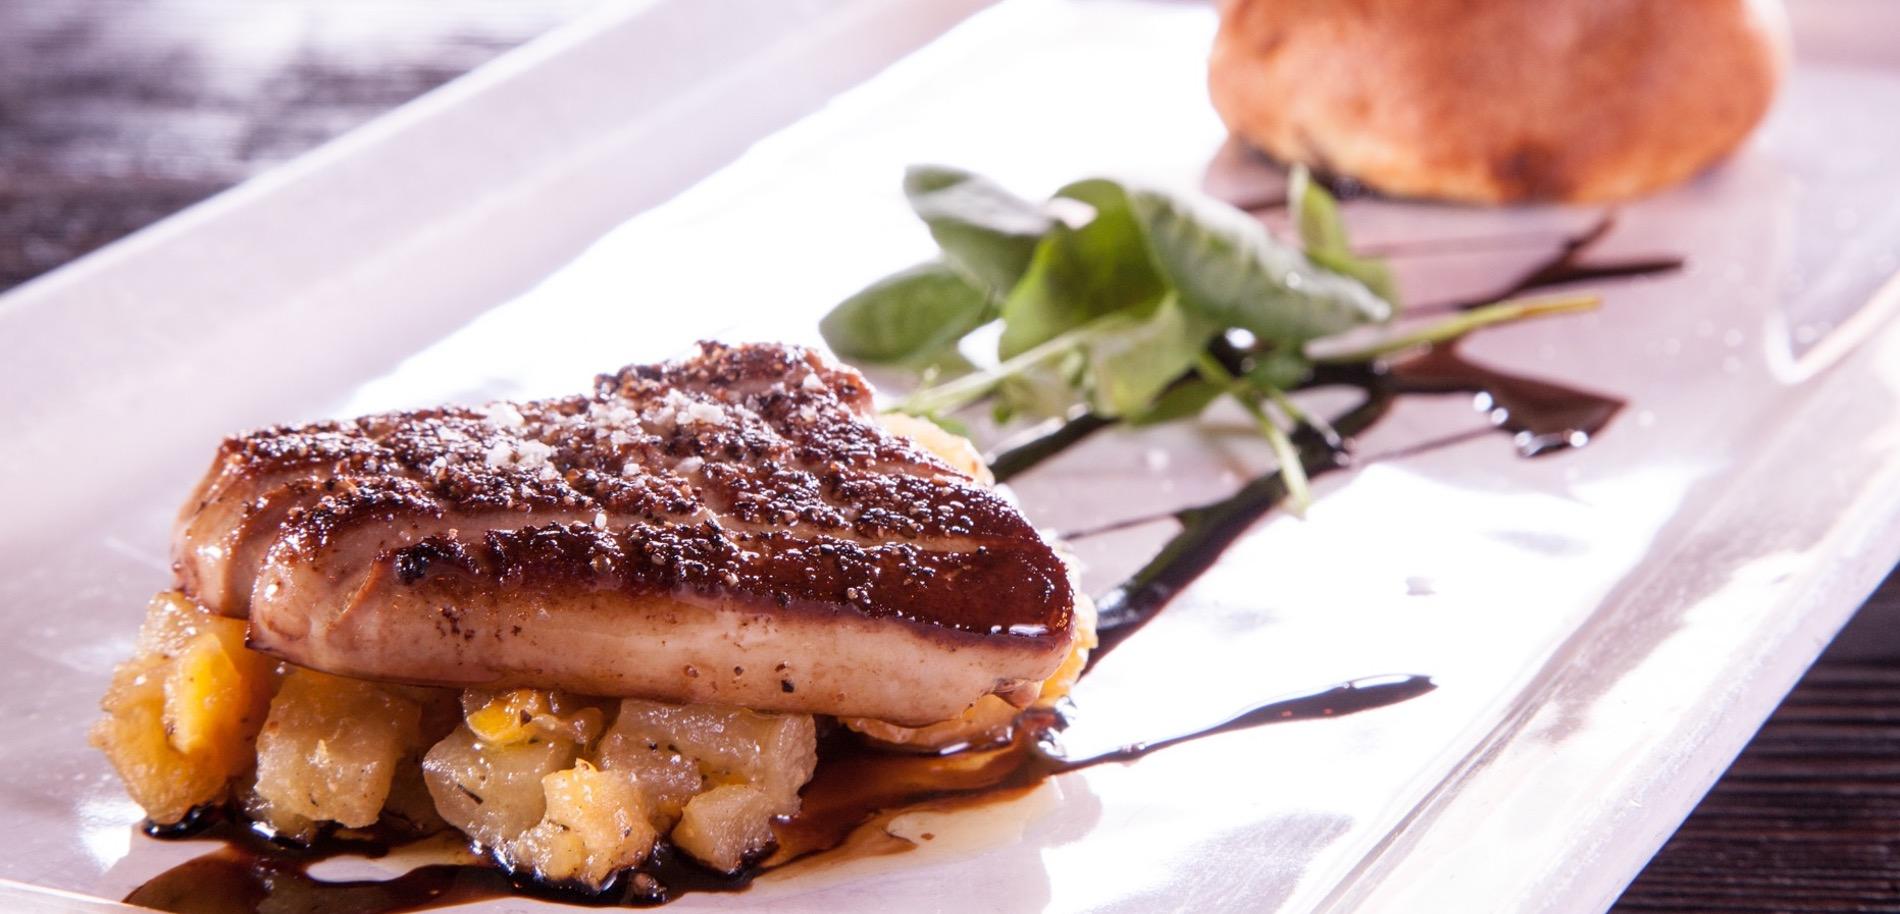 foie_gras@2x.jpg